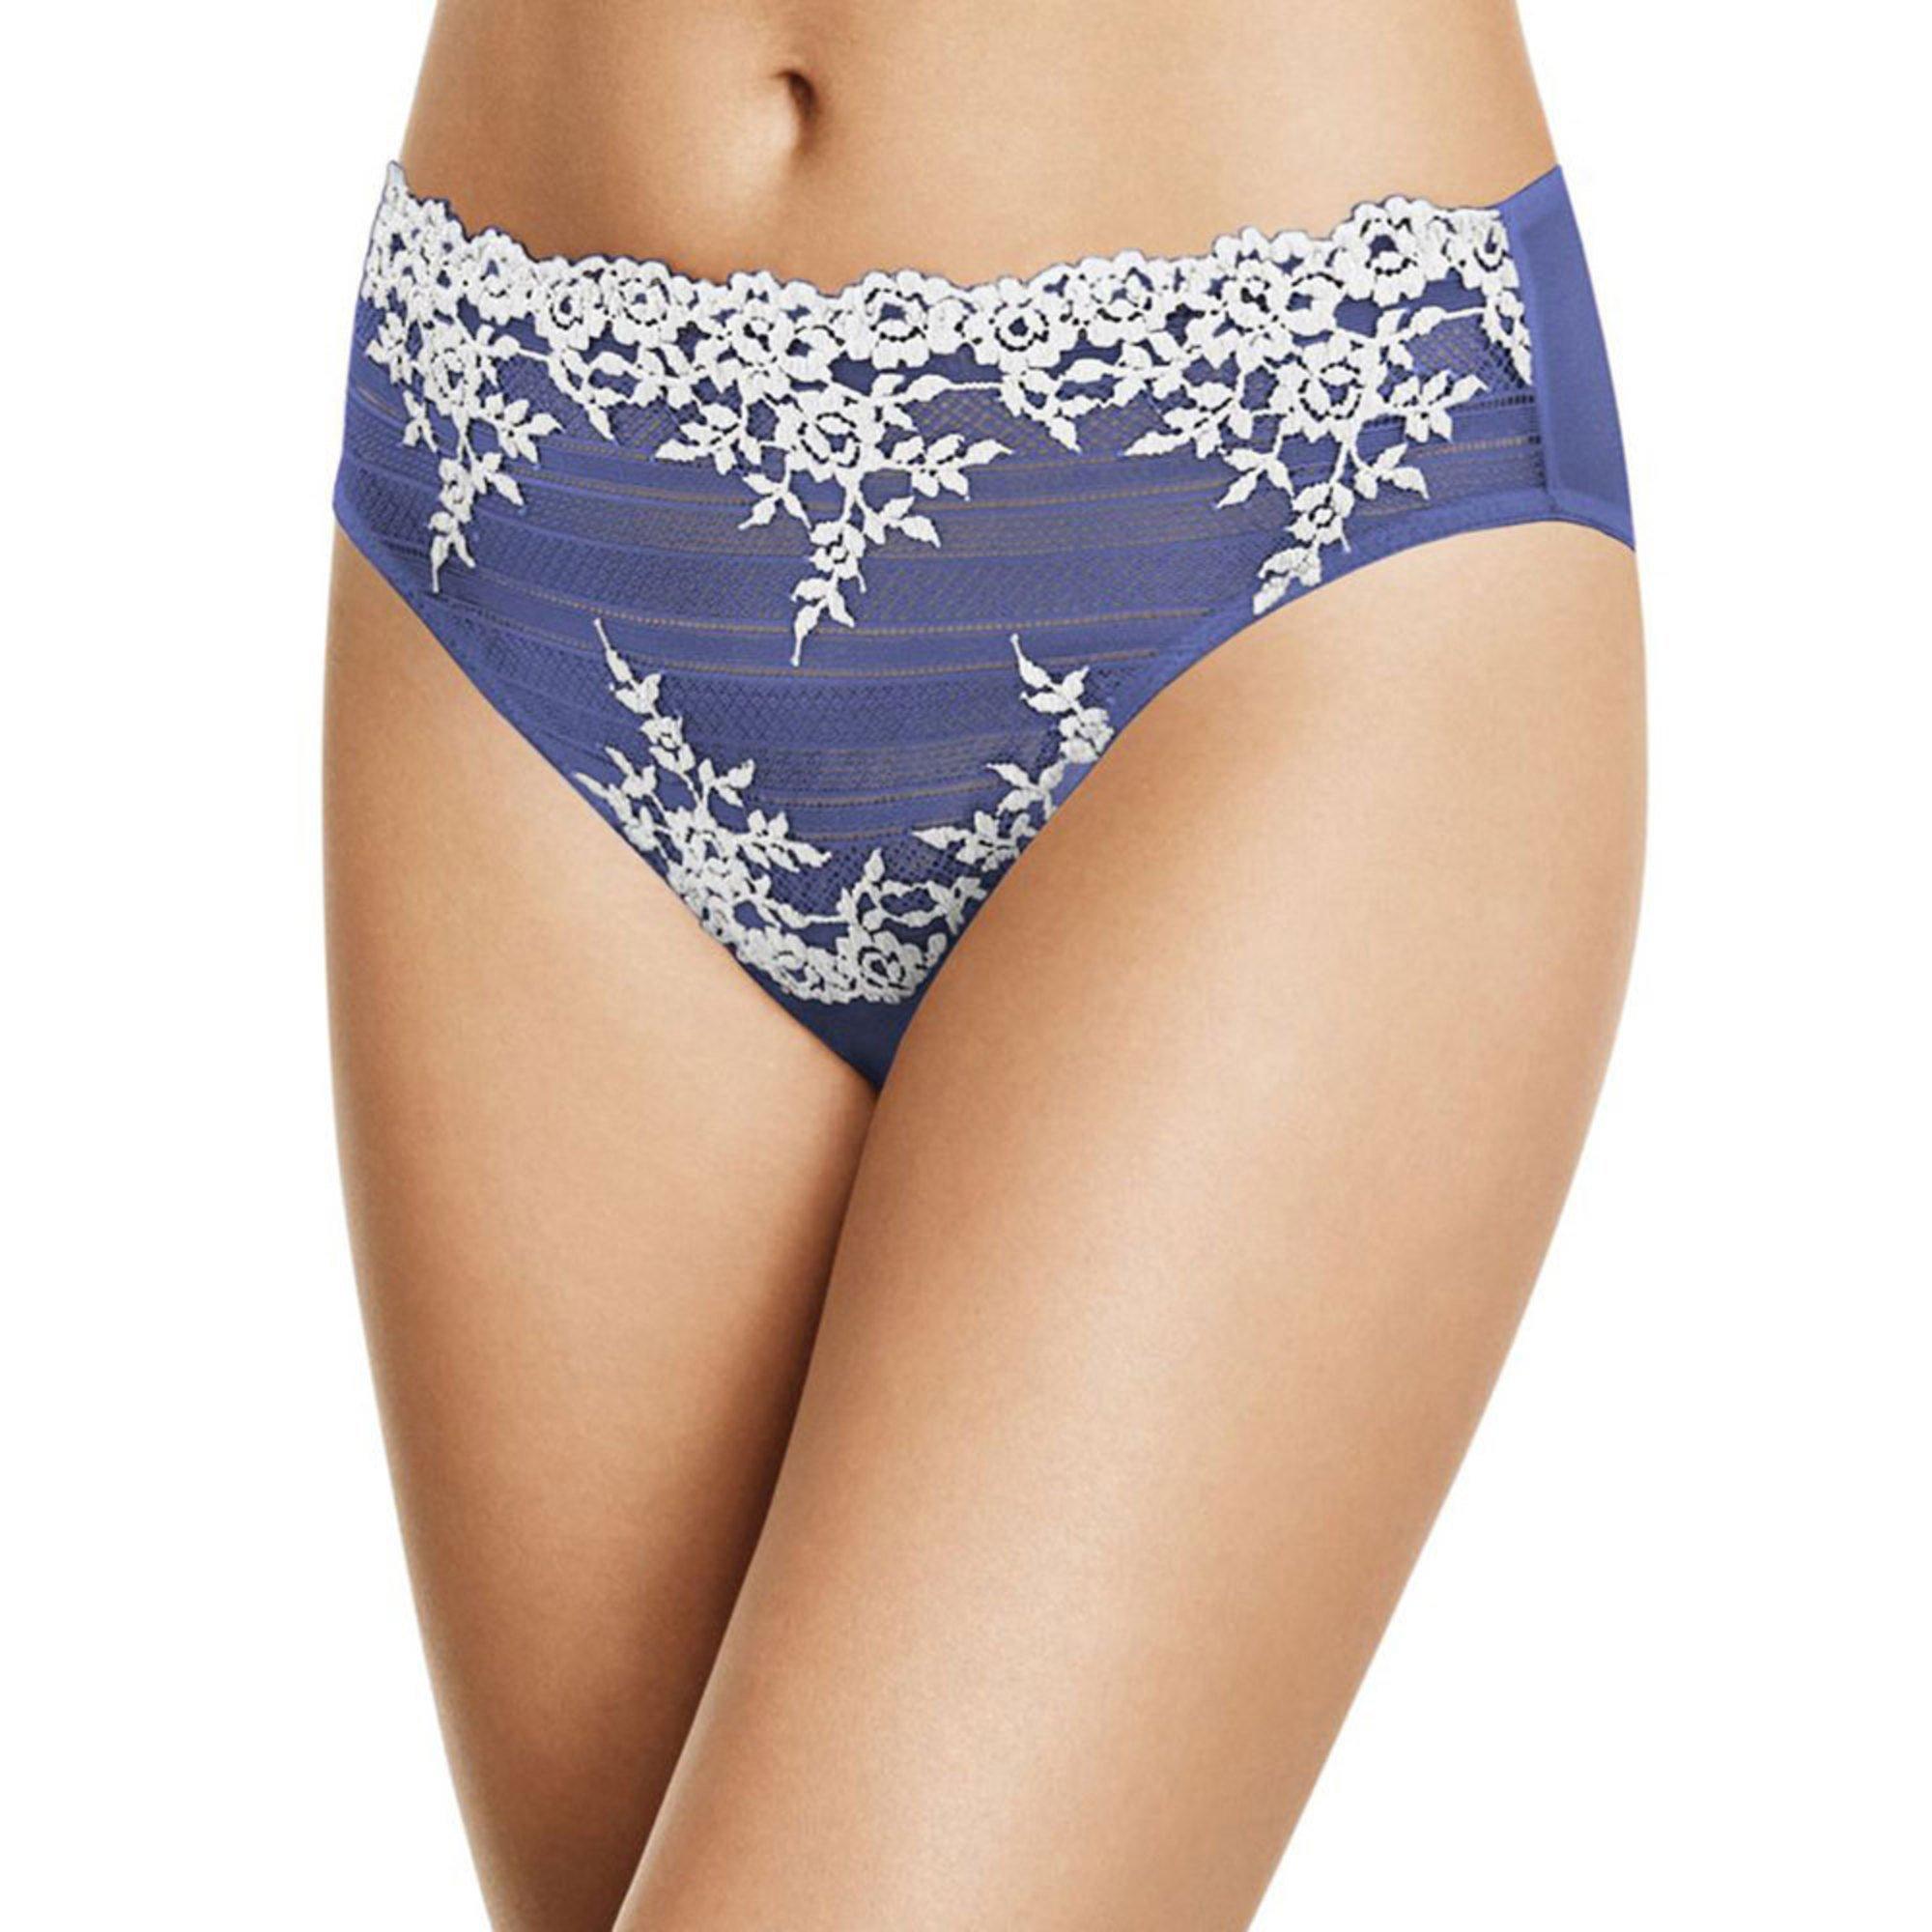 4573eb3624a7 Wacoal Women's Embrace Lace High Cut Brief   Hi-cut Panties ...